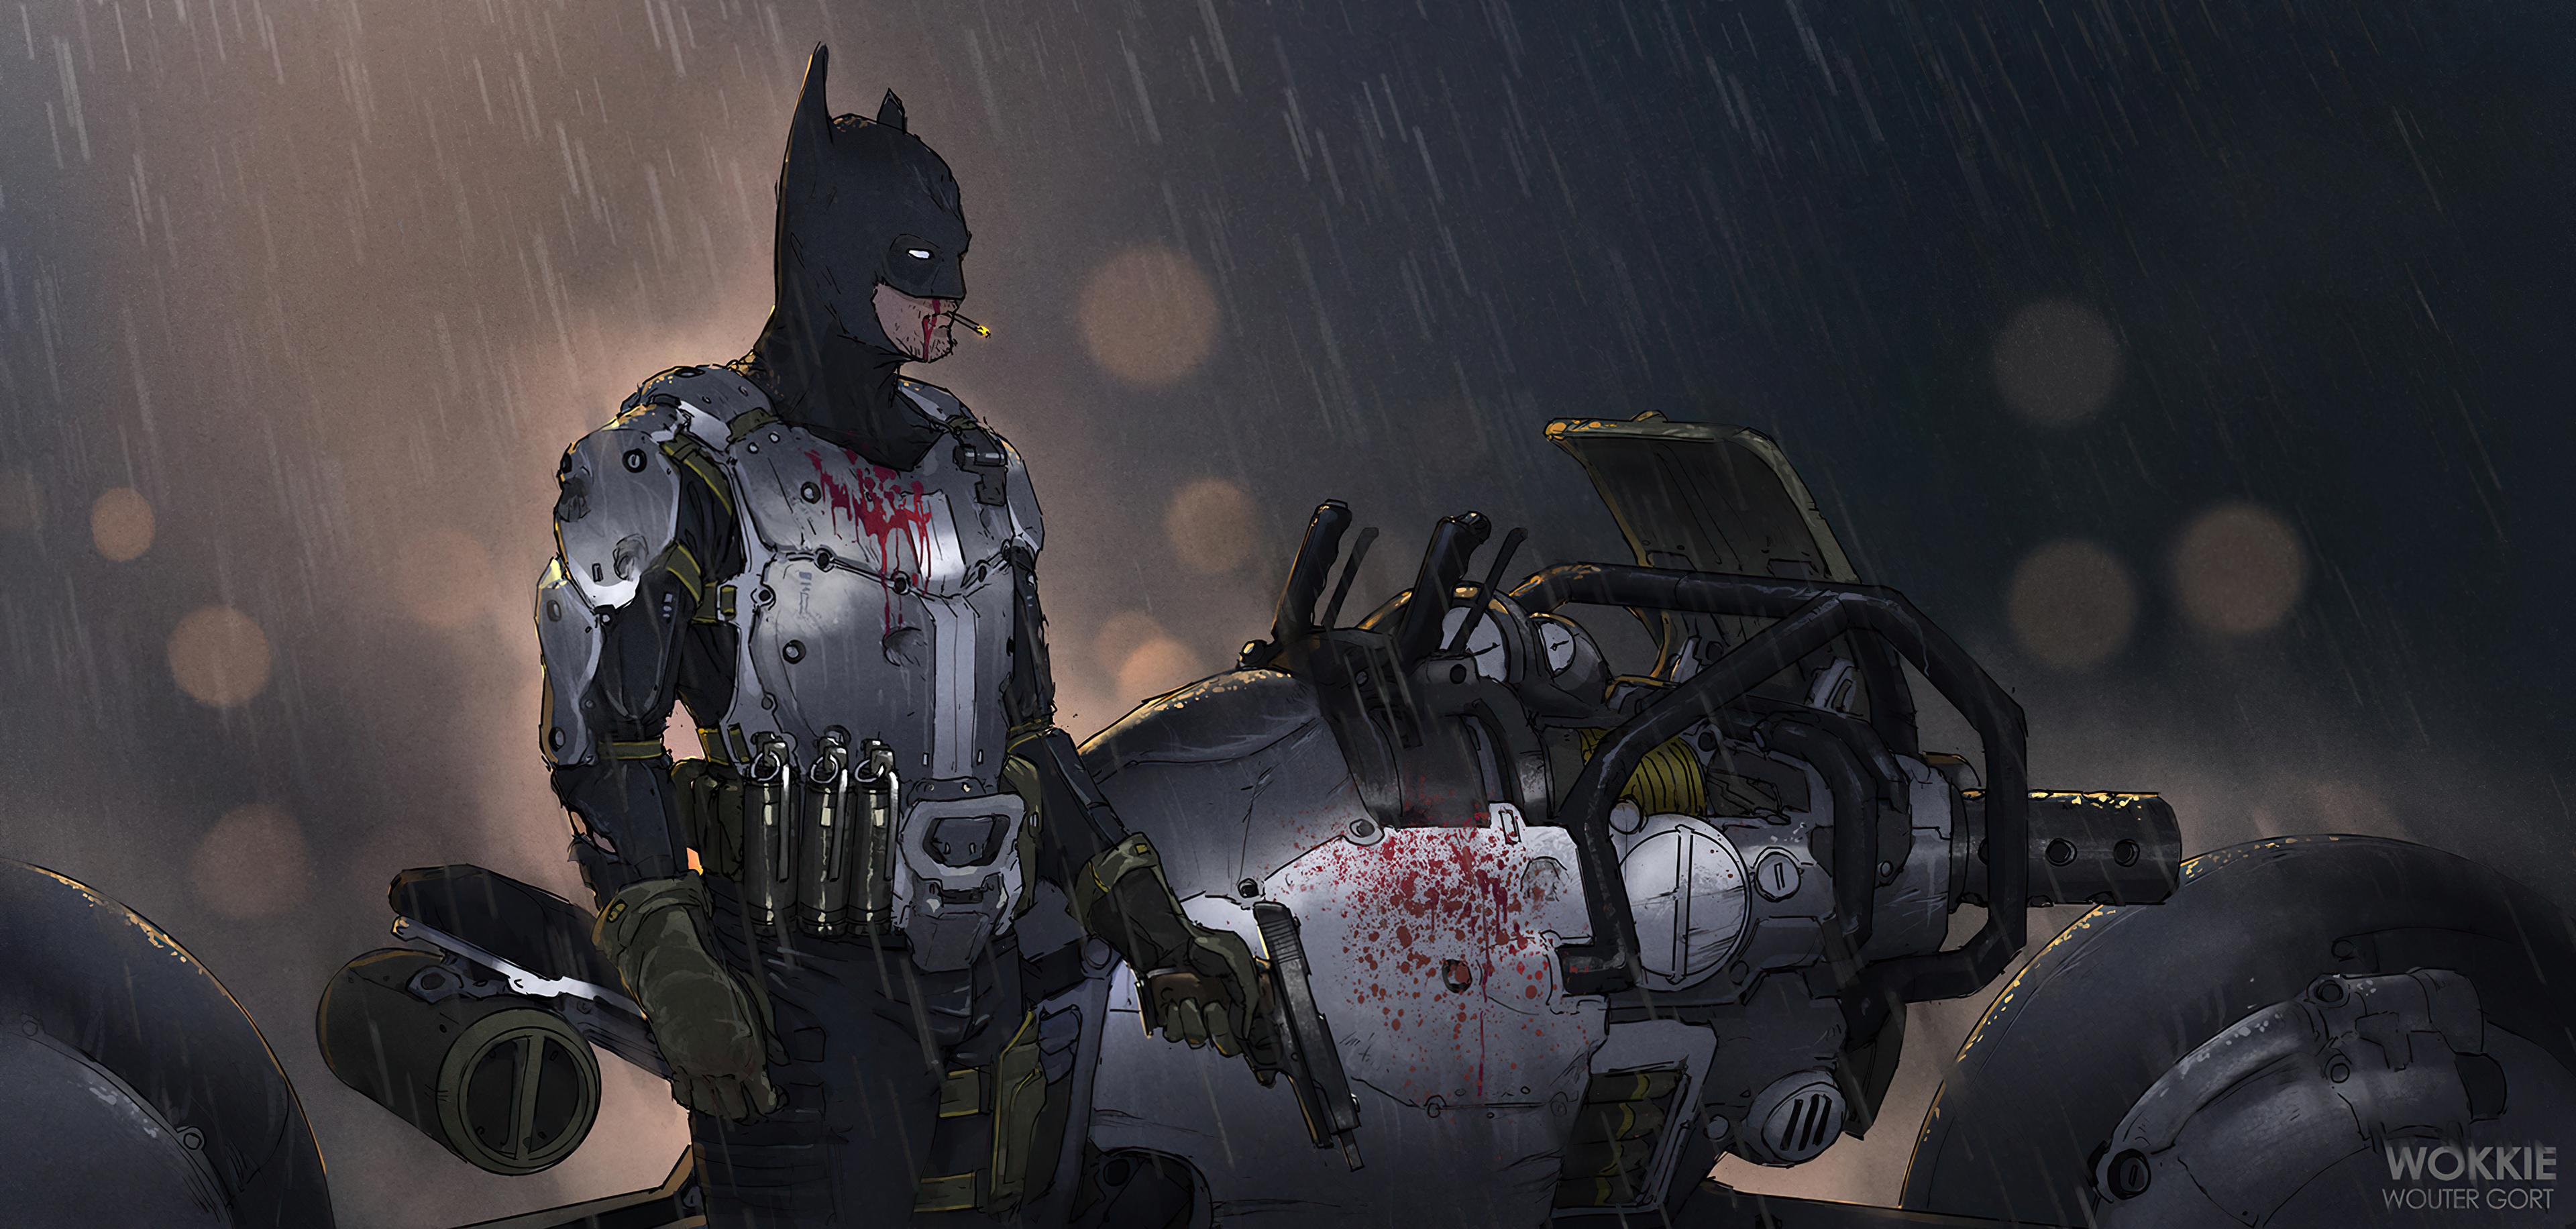 lo fi batman 4k 1617445731 - Lo Fi Batman 4k - Lo Fi Batman 4k wallpapers